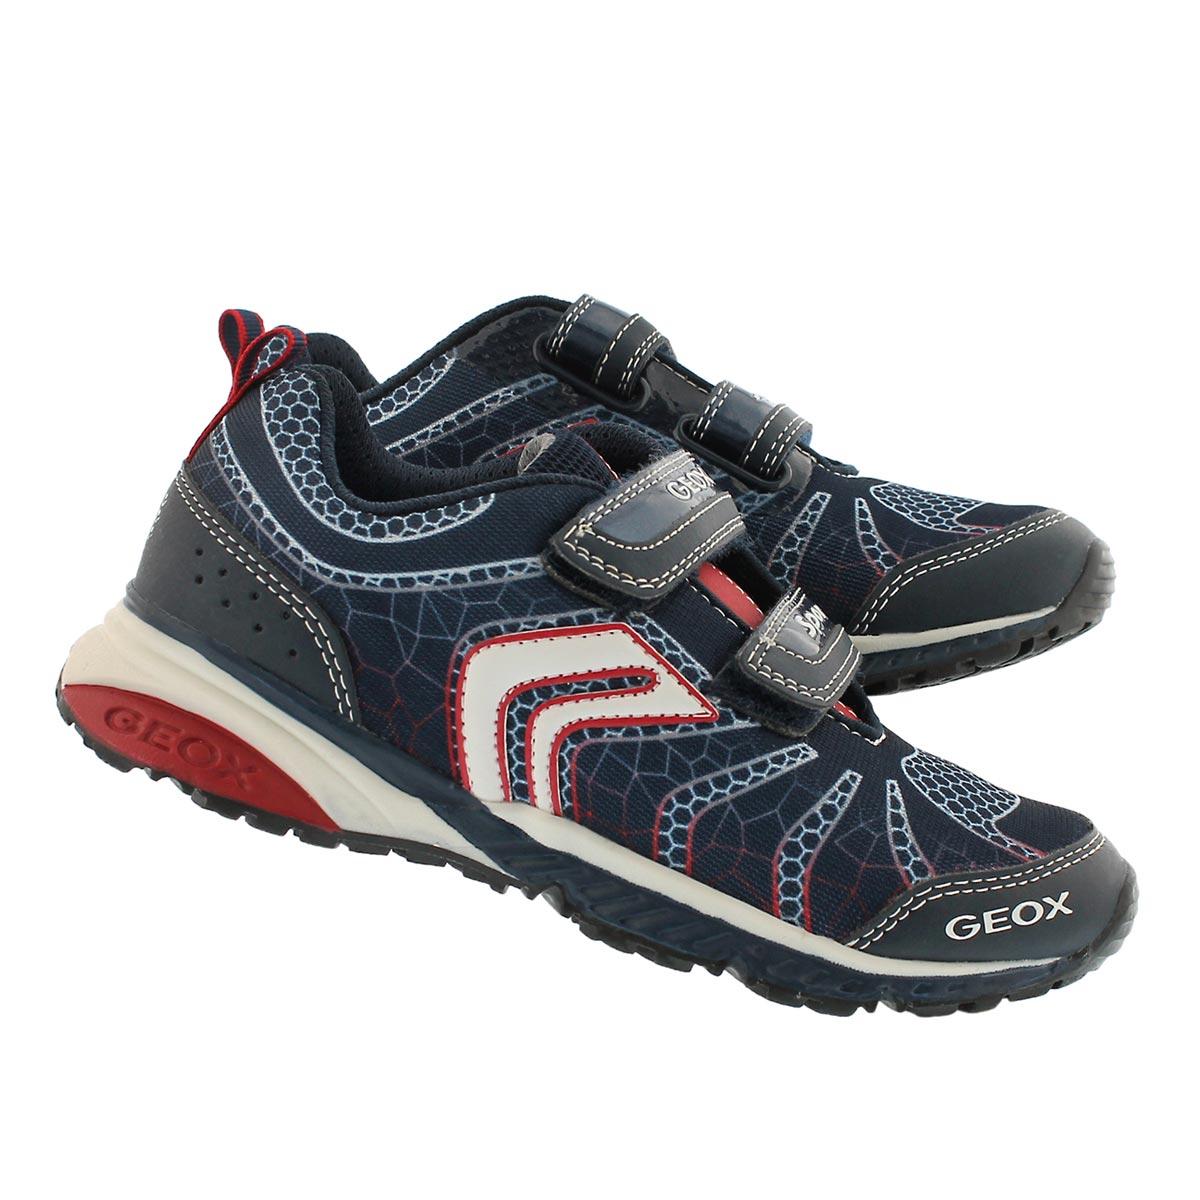 Geox Kids Tennis Shoes